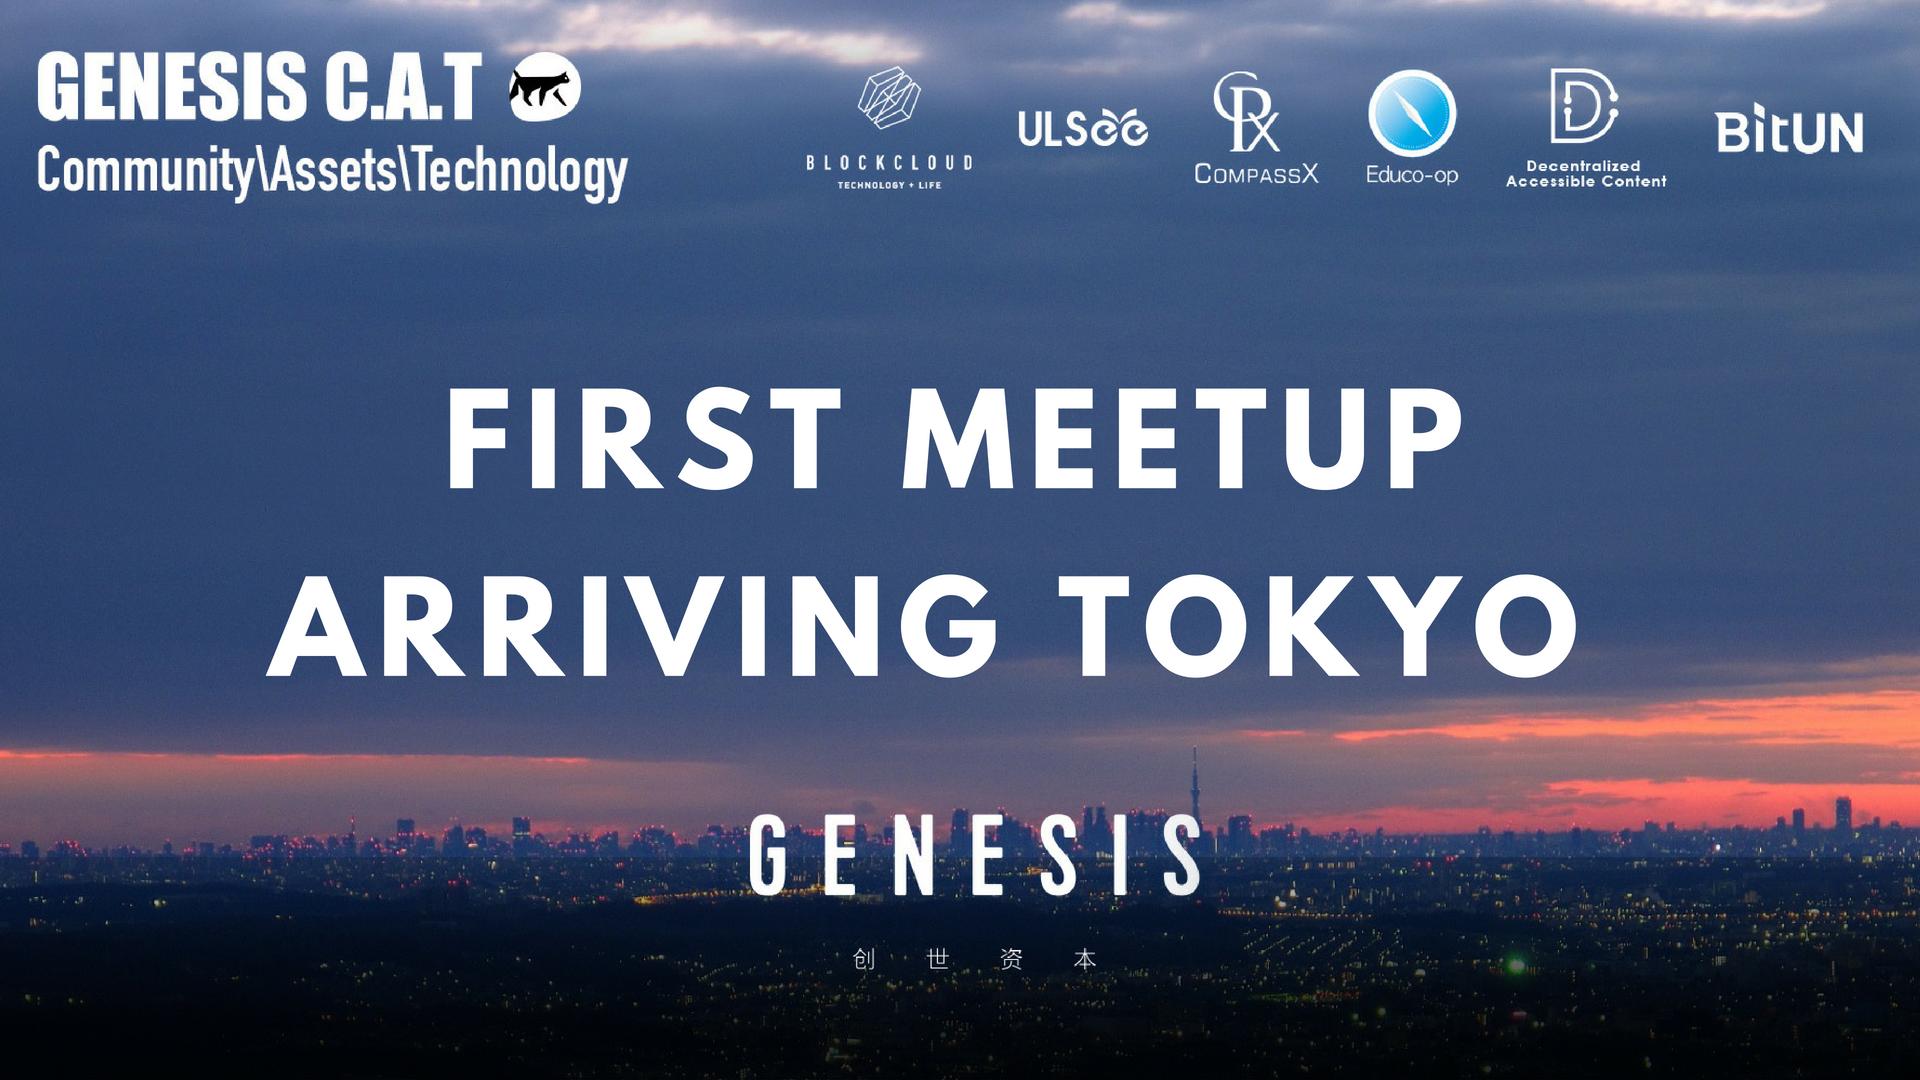 GENESIS C.A.Tが5月27日に東京で開催!最新ブロックチェーンプロジェクトの情報発信!